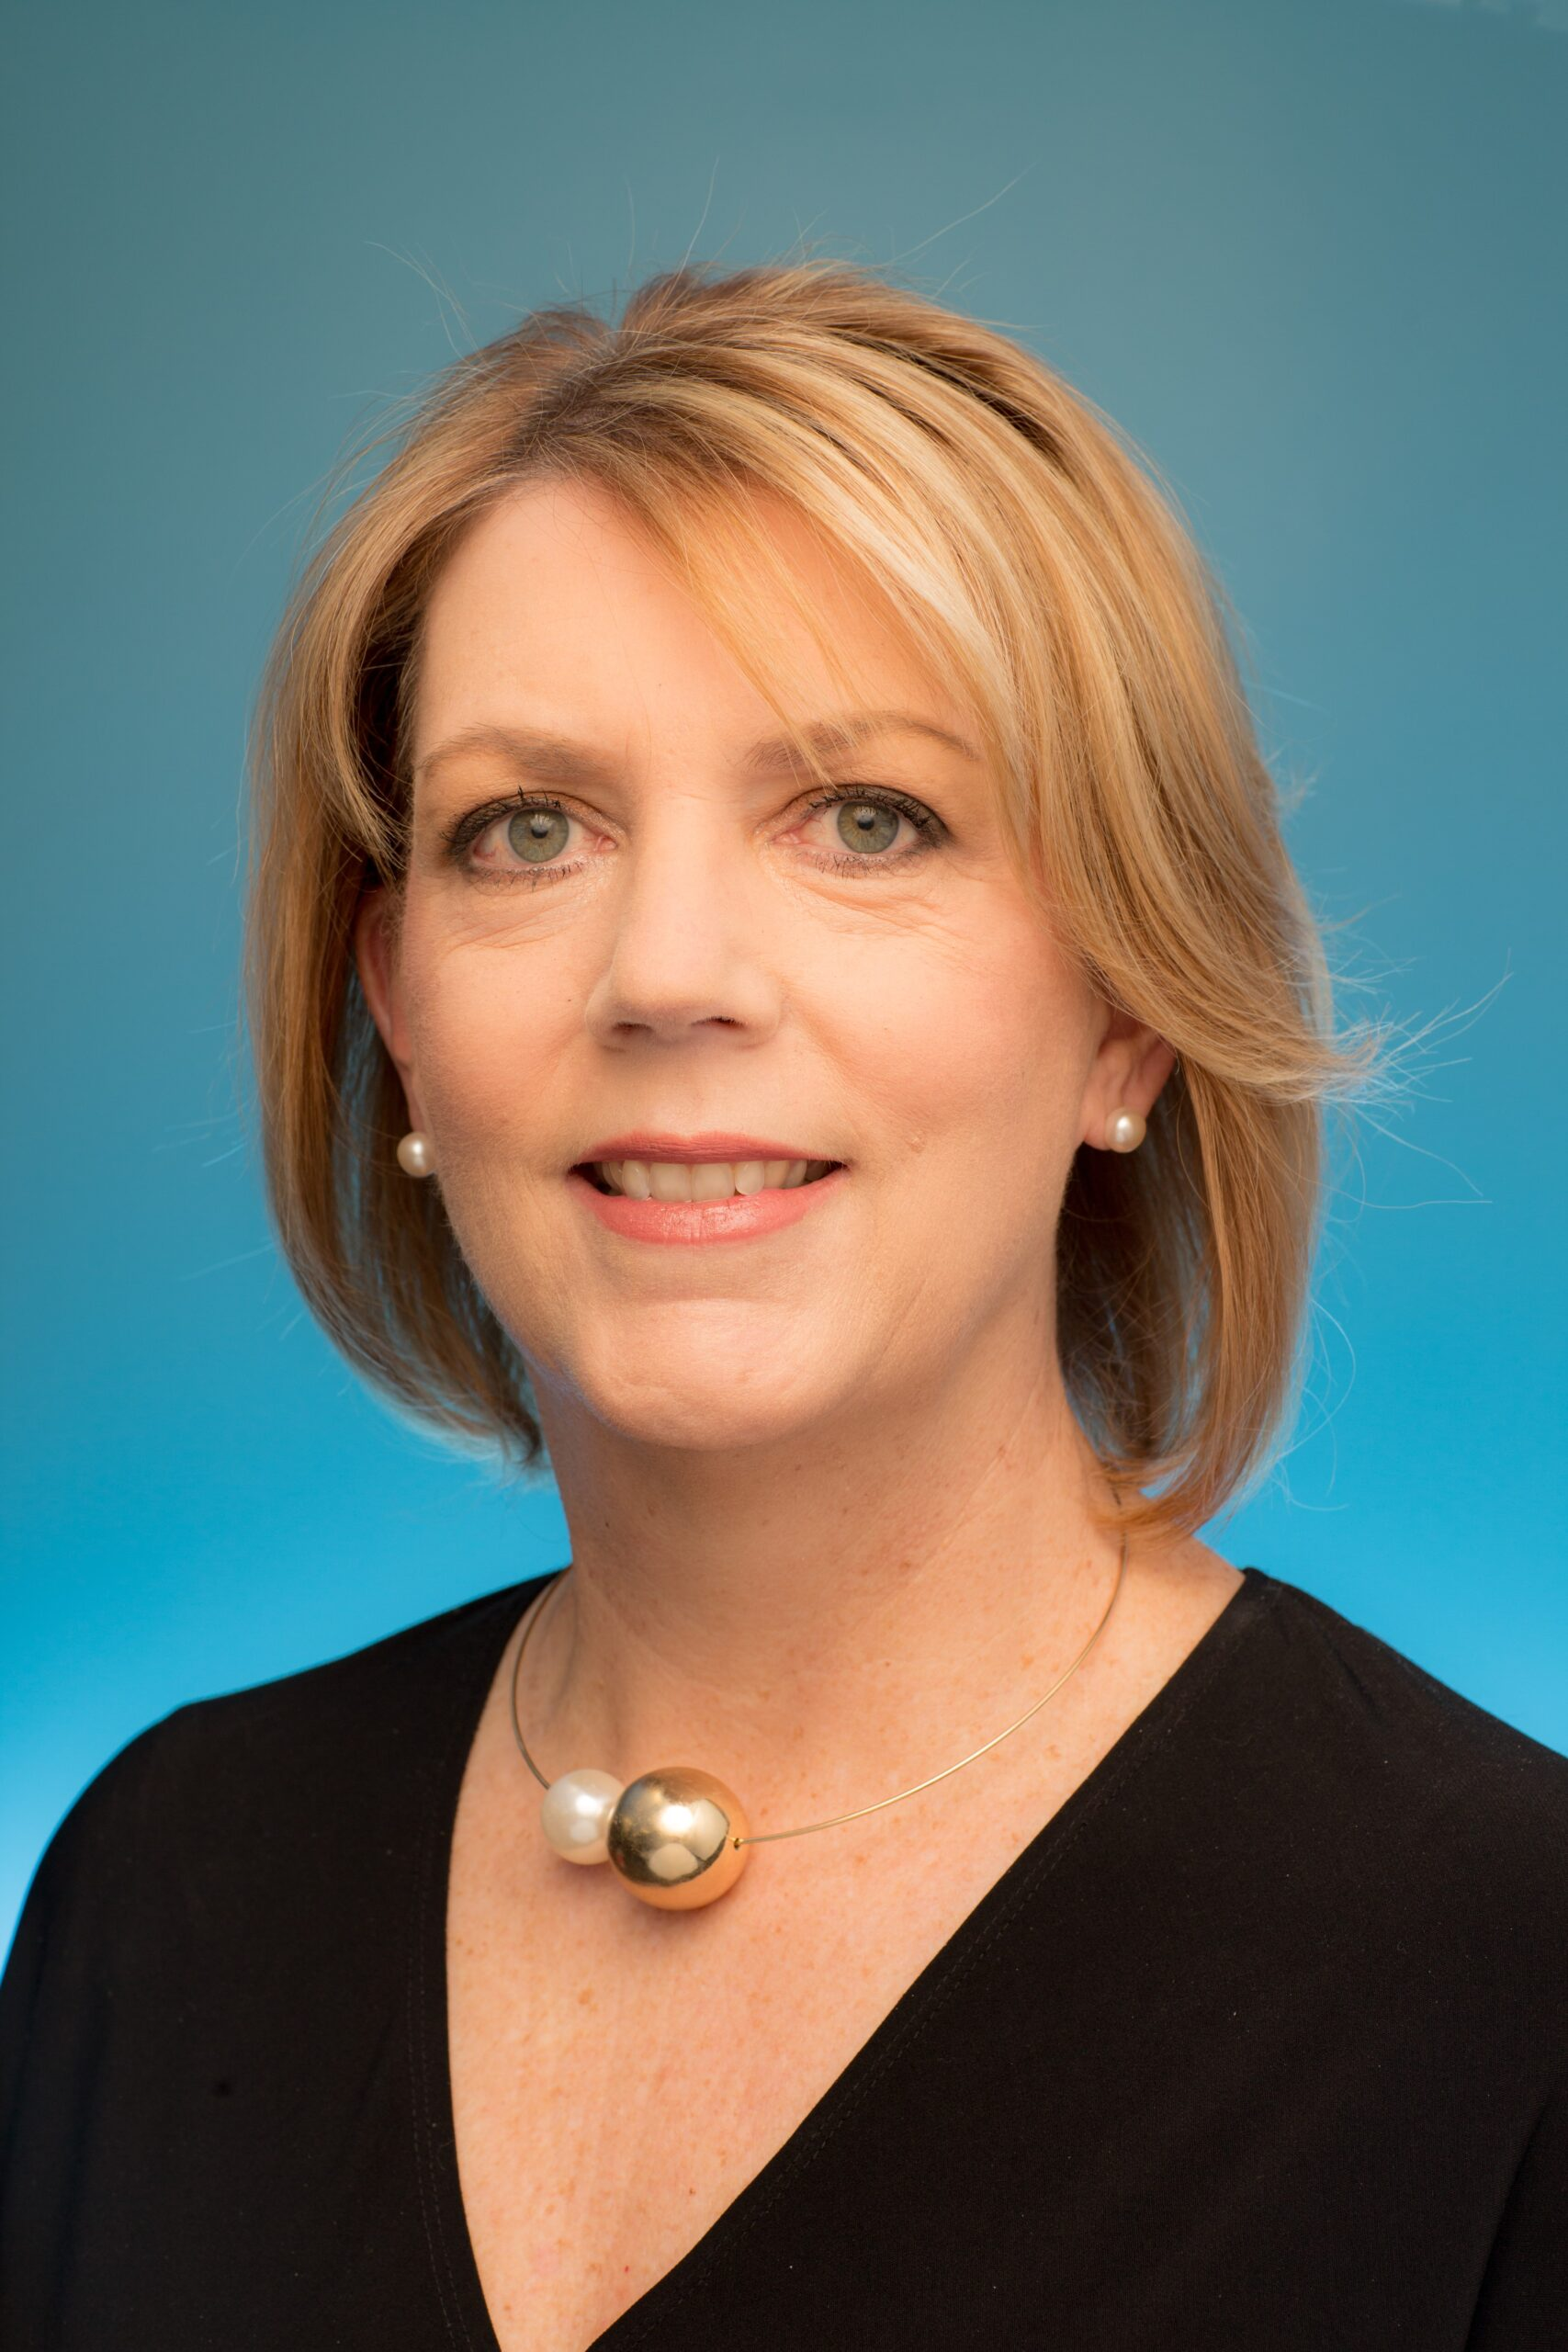 Headshot of AnnMaura Connolly